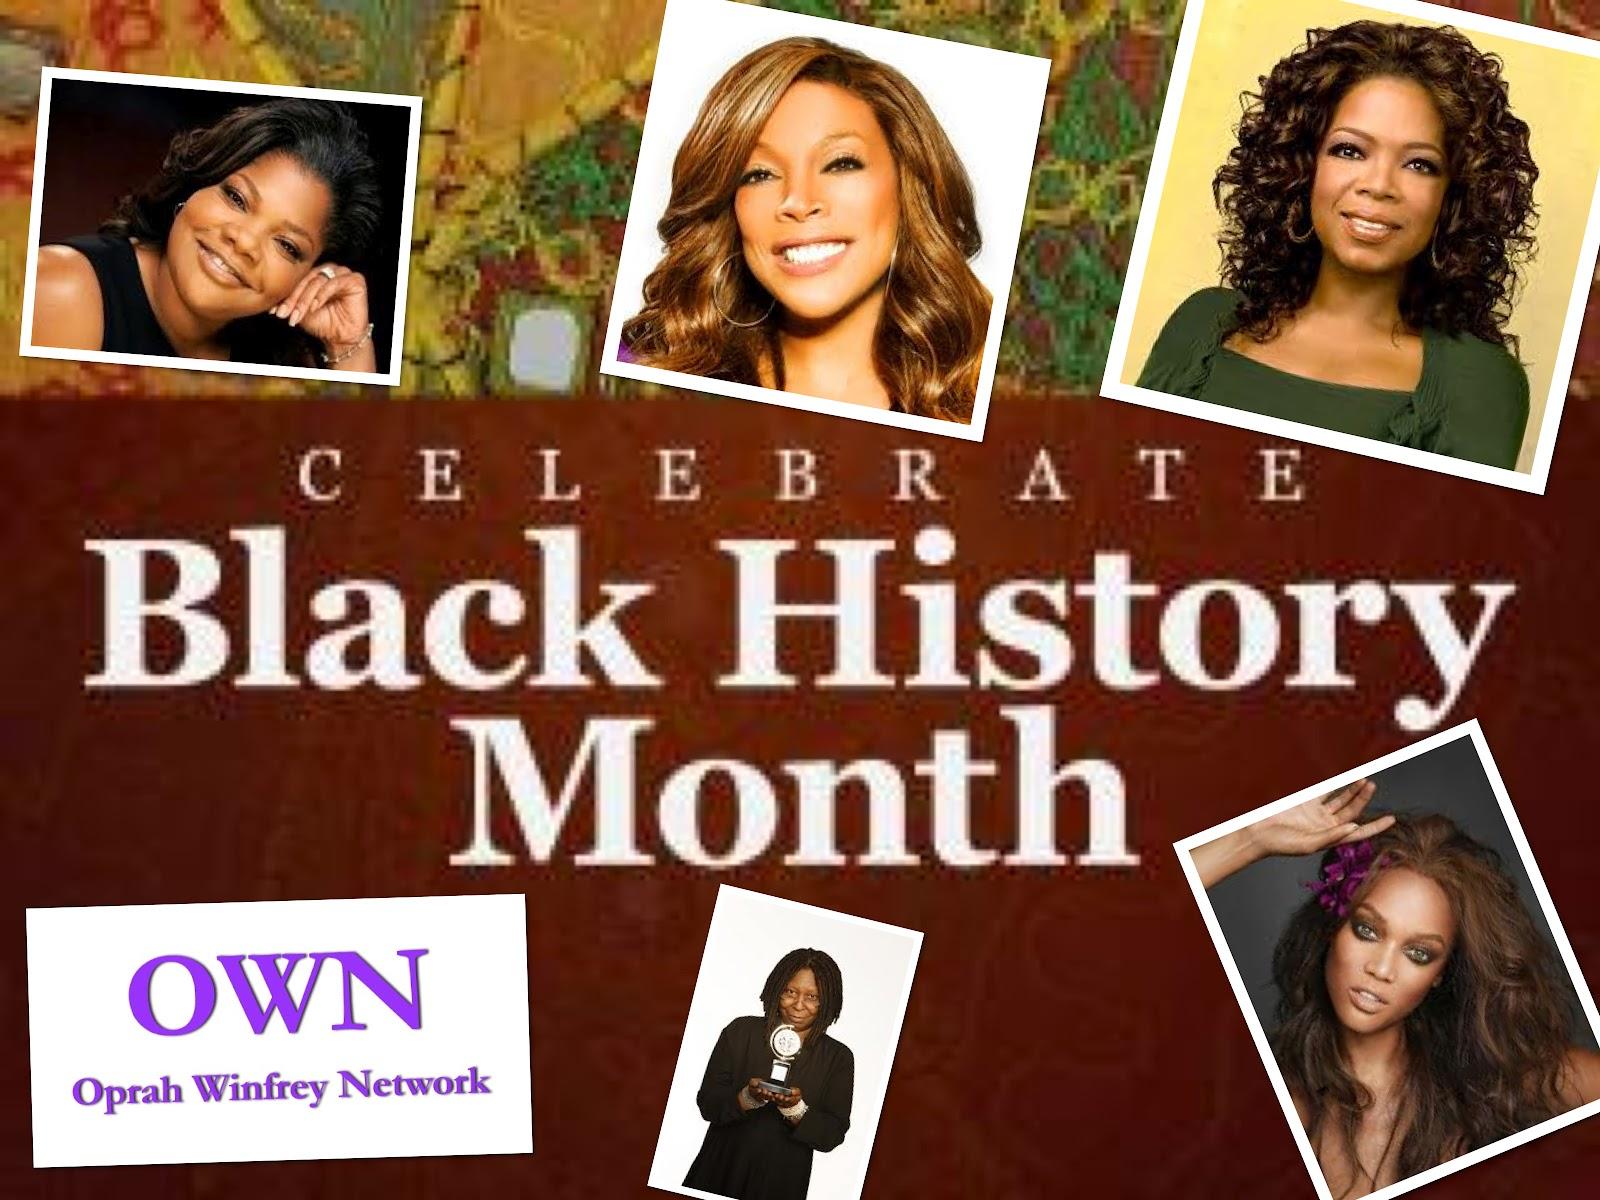 http://4.bp.blogspot.com/-V-FooyA1T1g/TzIBoCW3sOI/AAAAAAAAAMg/0sIxrC_FLpQ/s1600/black+history+media+oprah.jpg